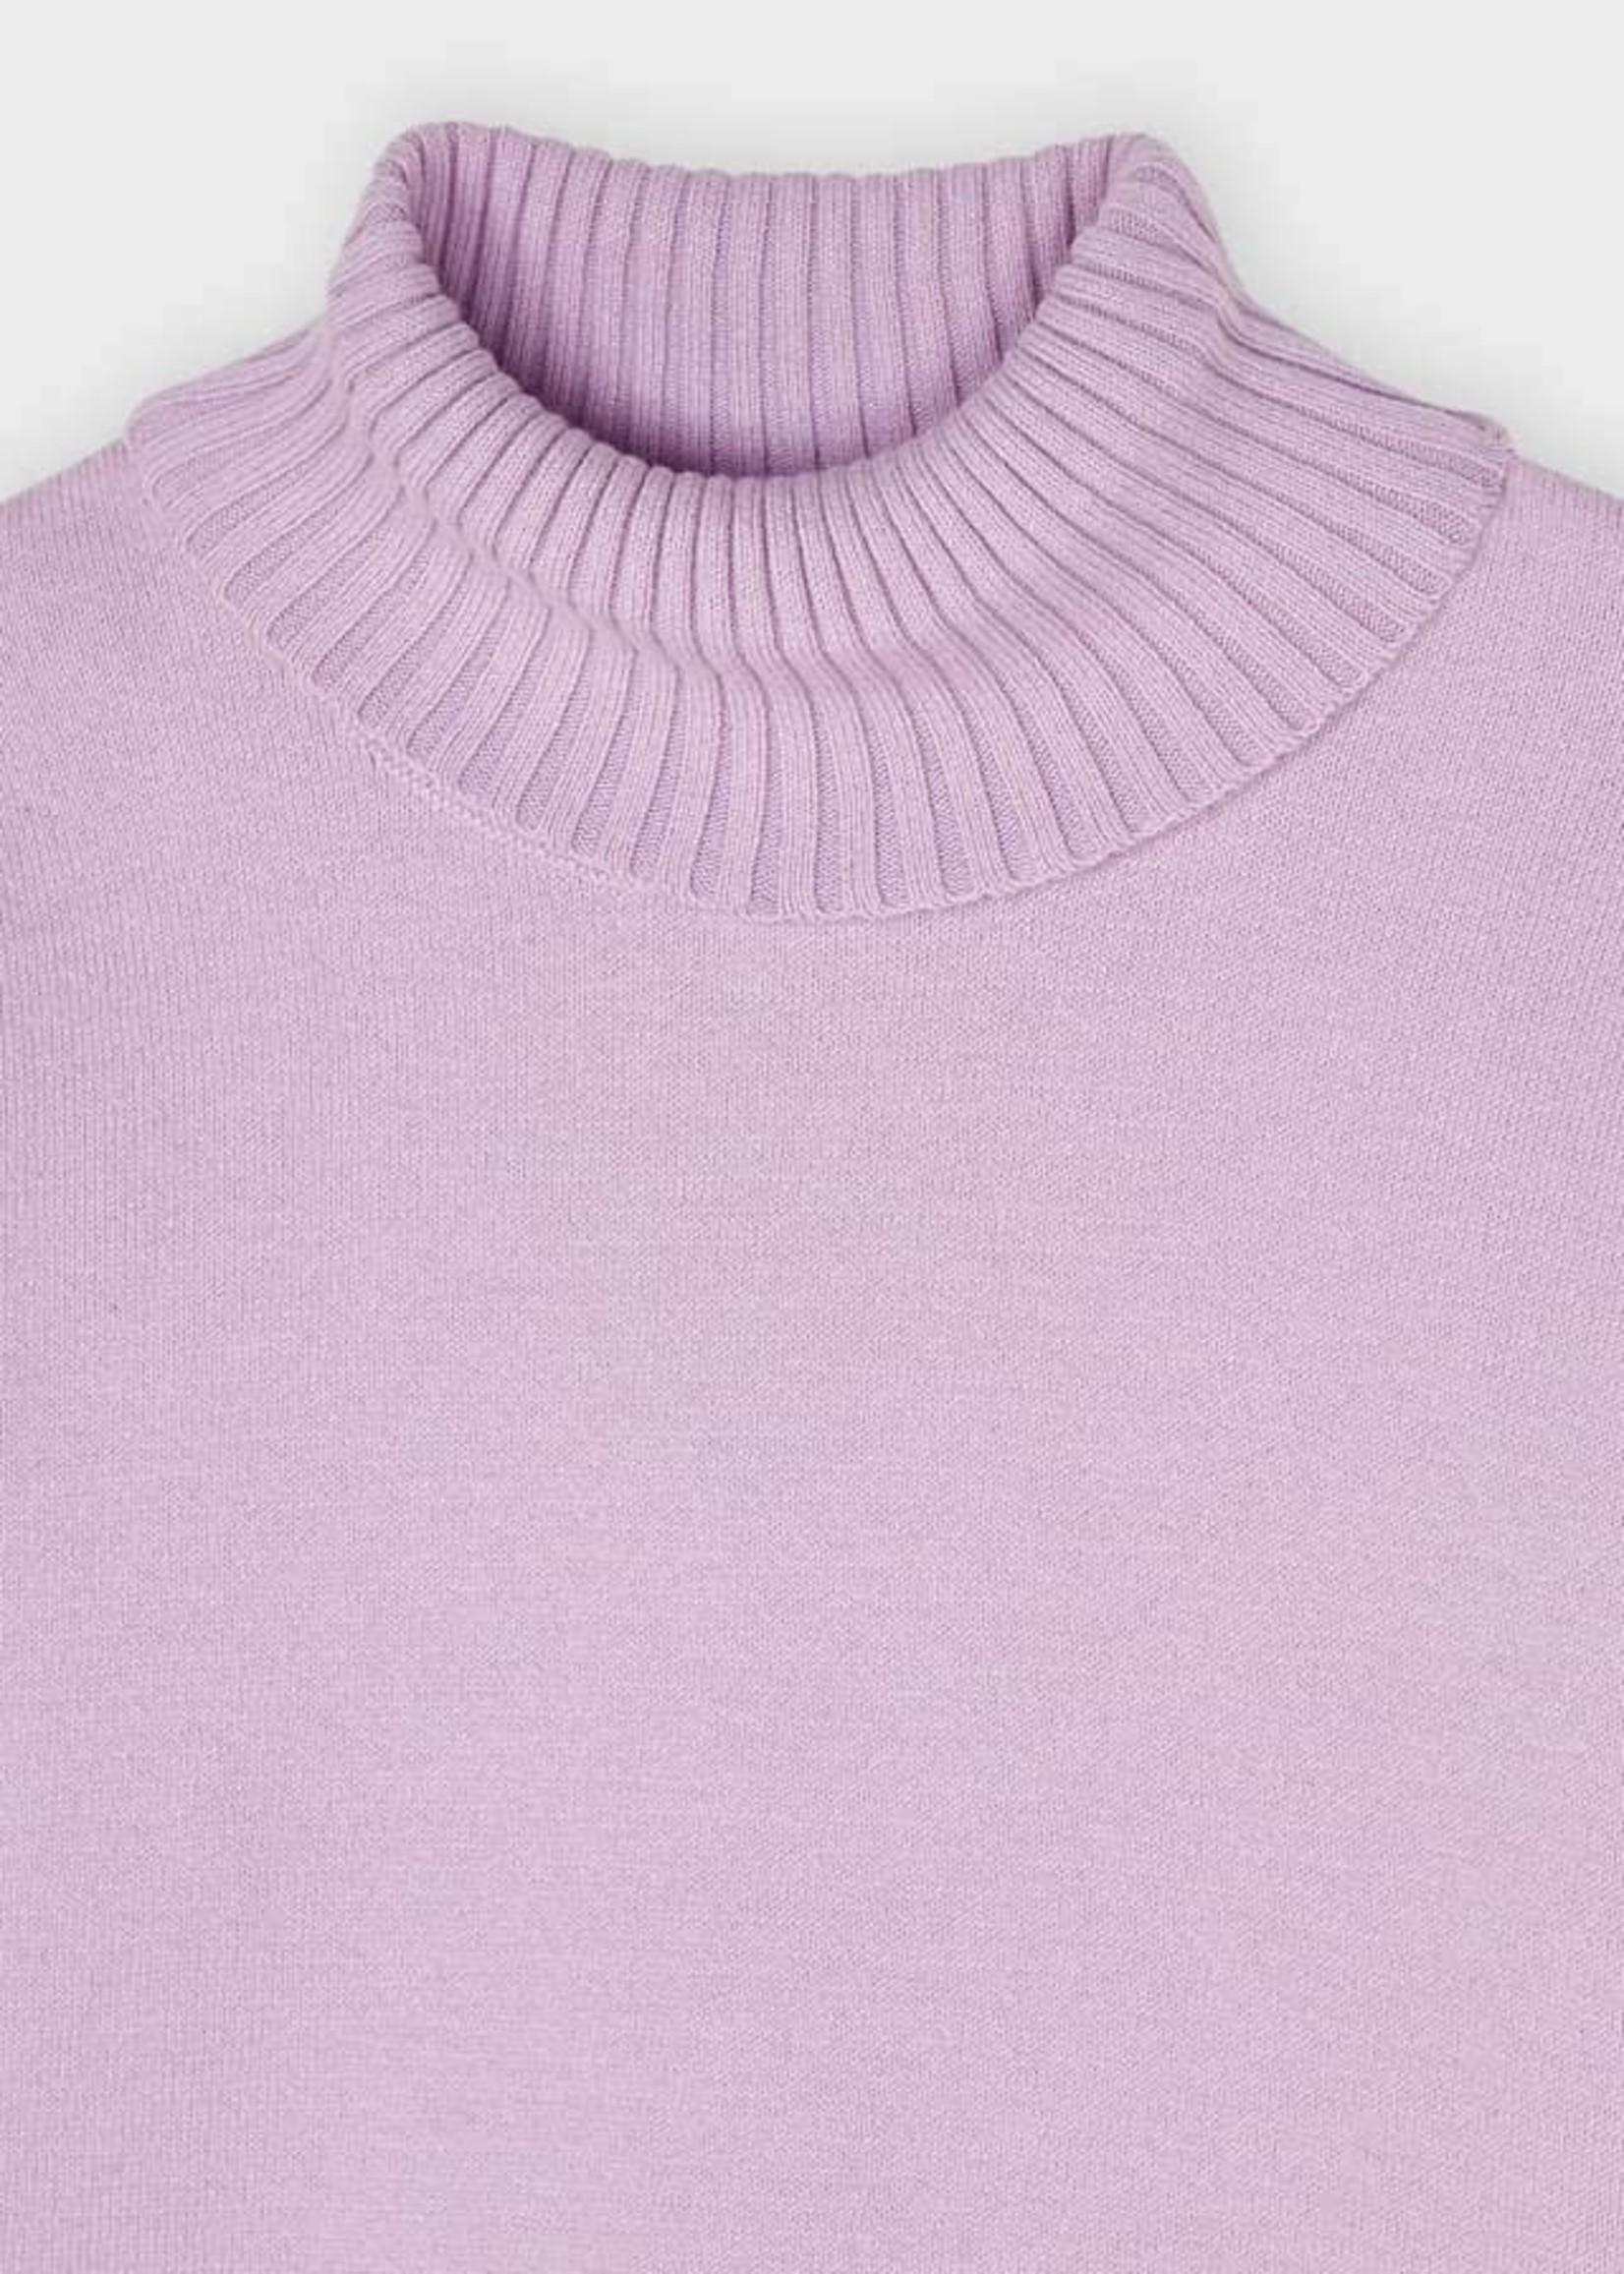 MAYORAL MAYORAL Colltrui basic knitting lila